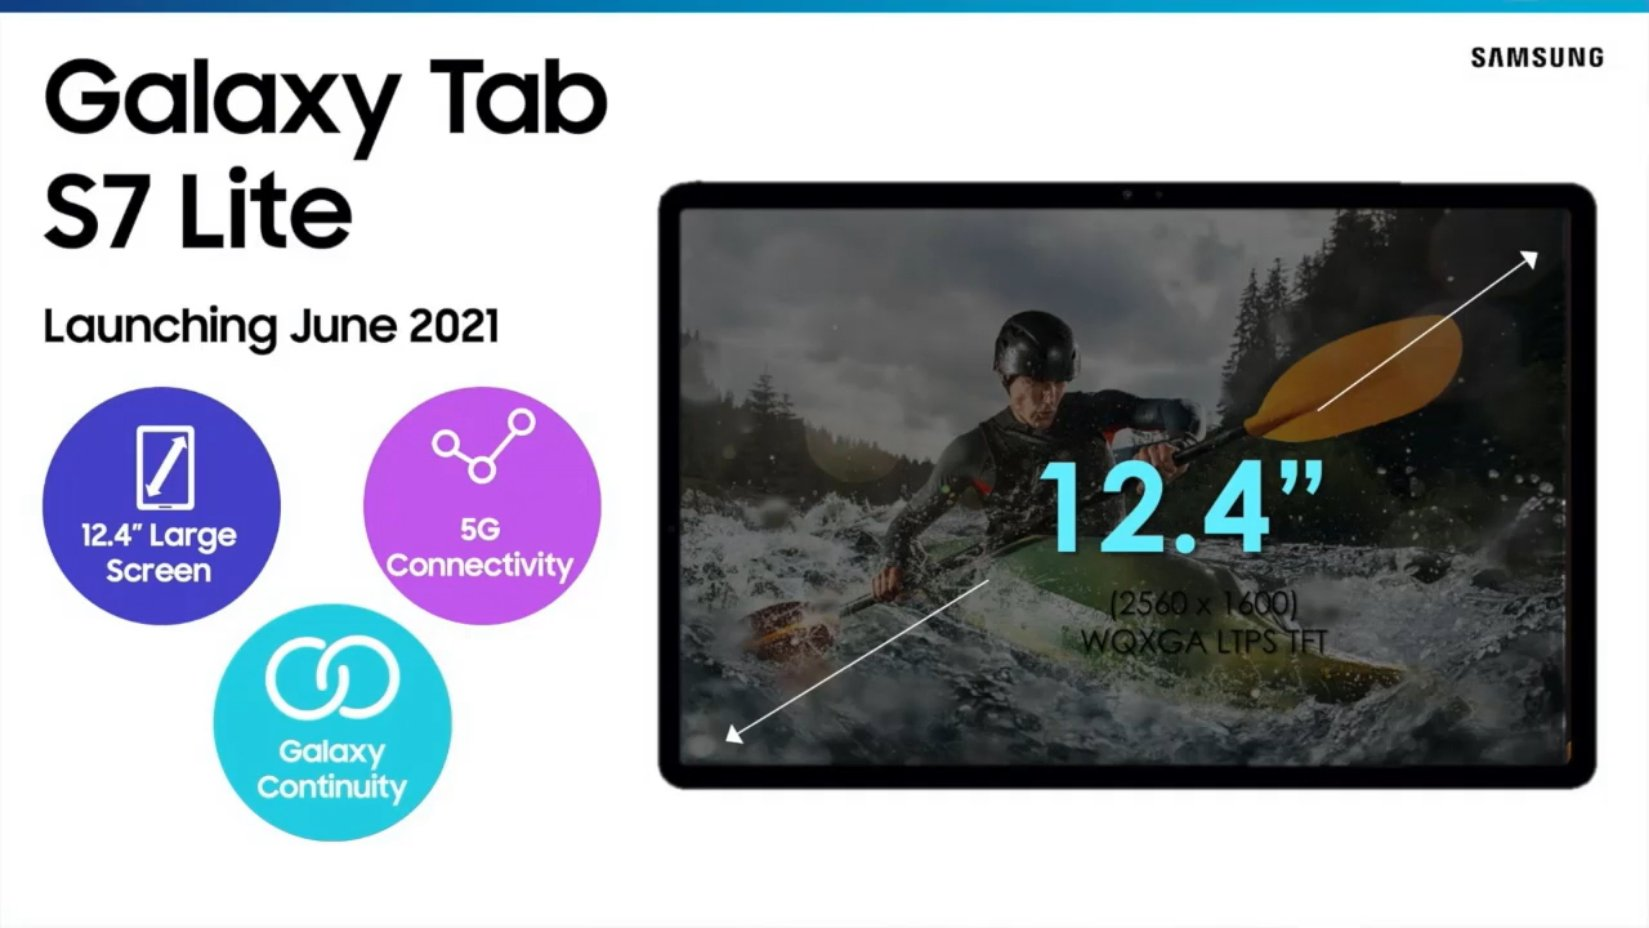 Samsung Galaxy Tab S7 Lite 5G tablet